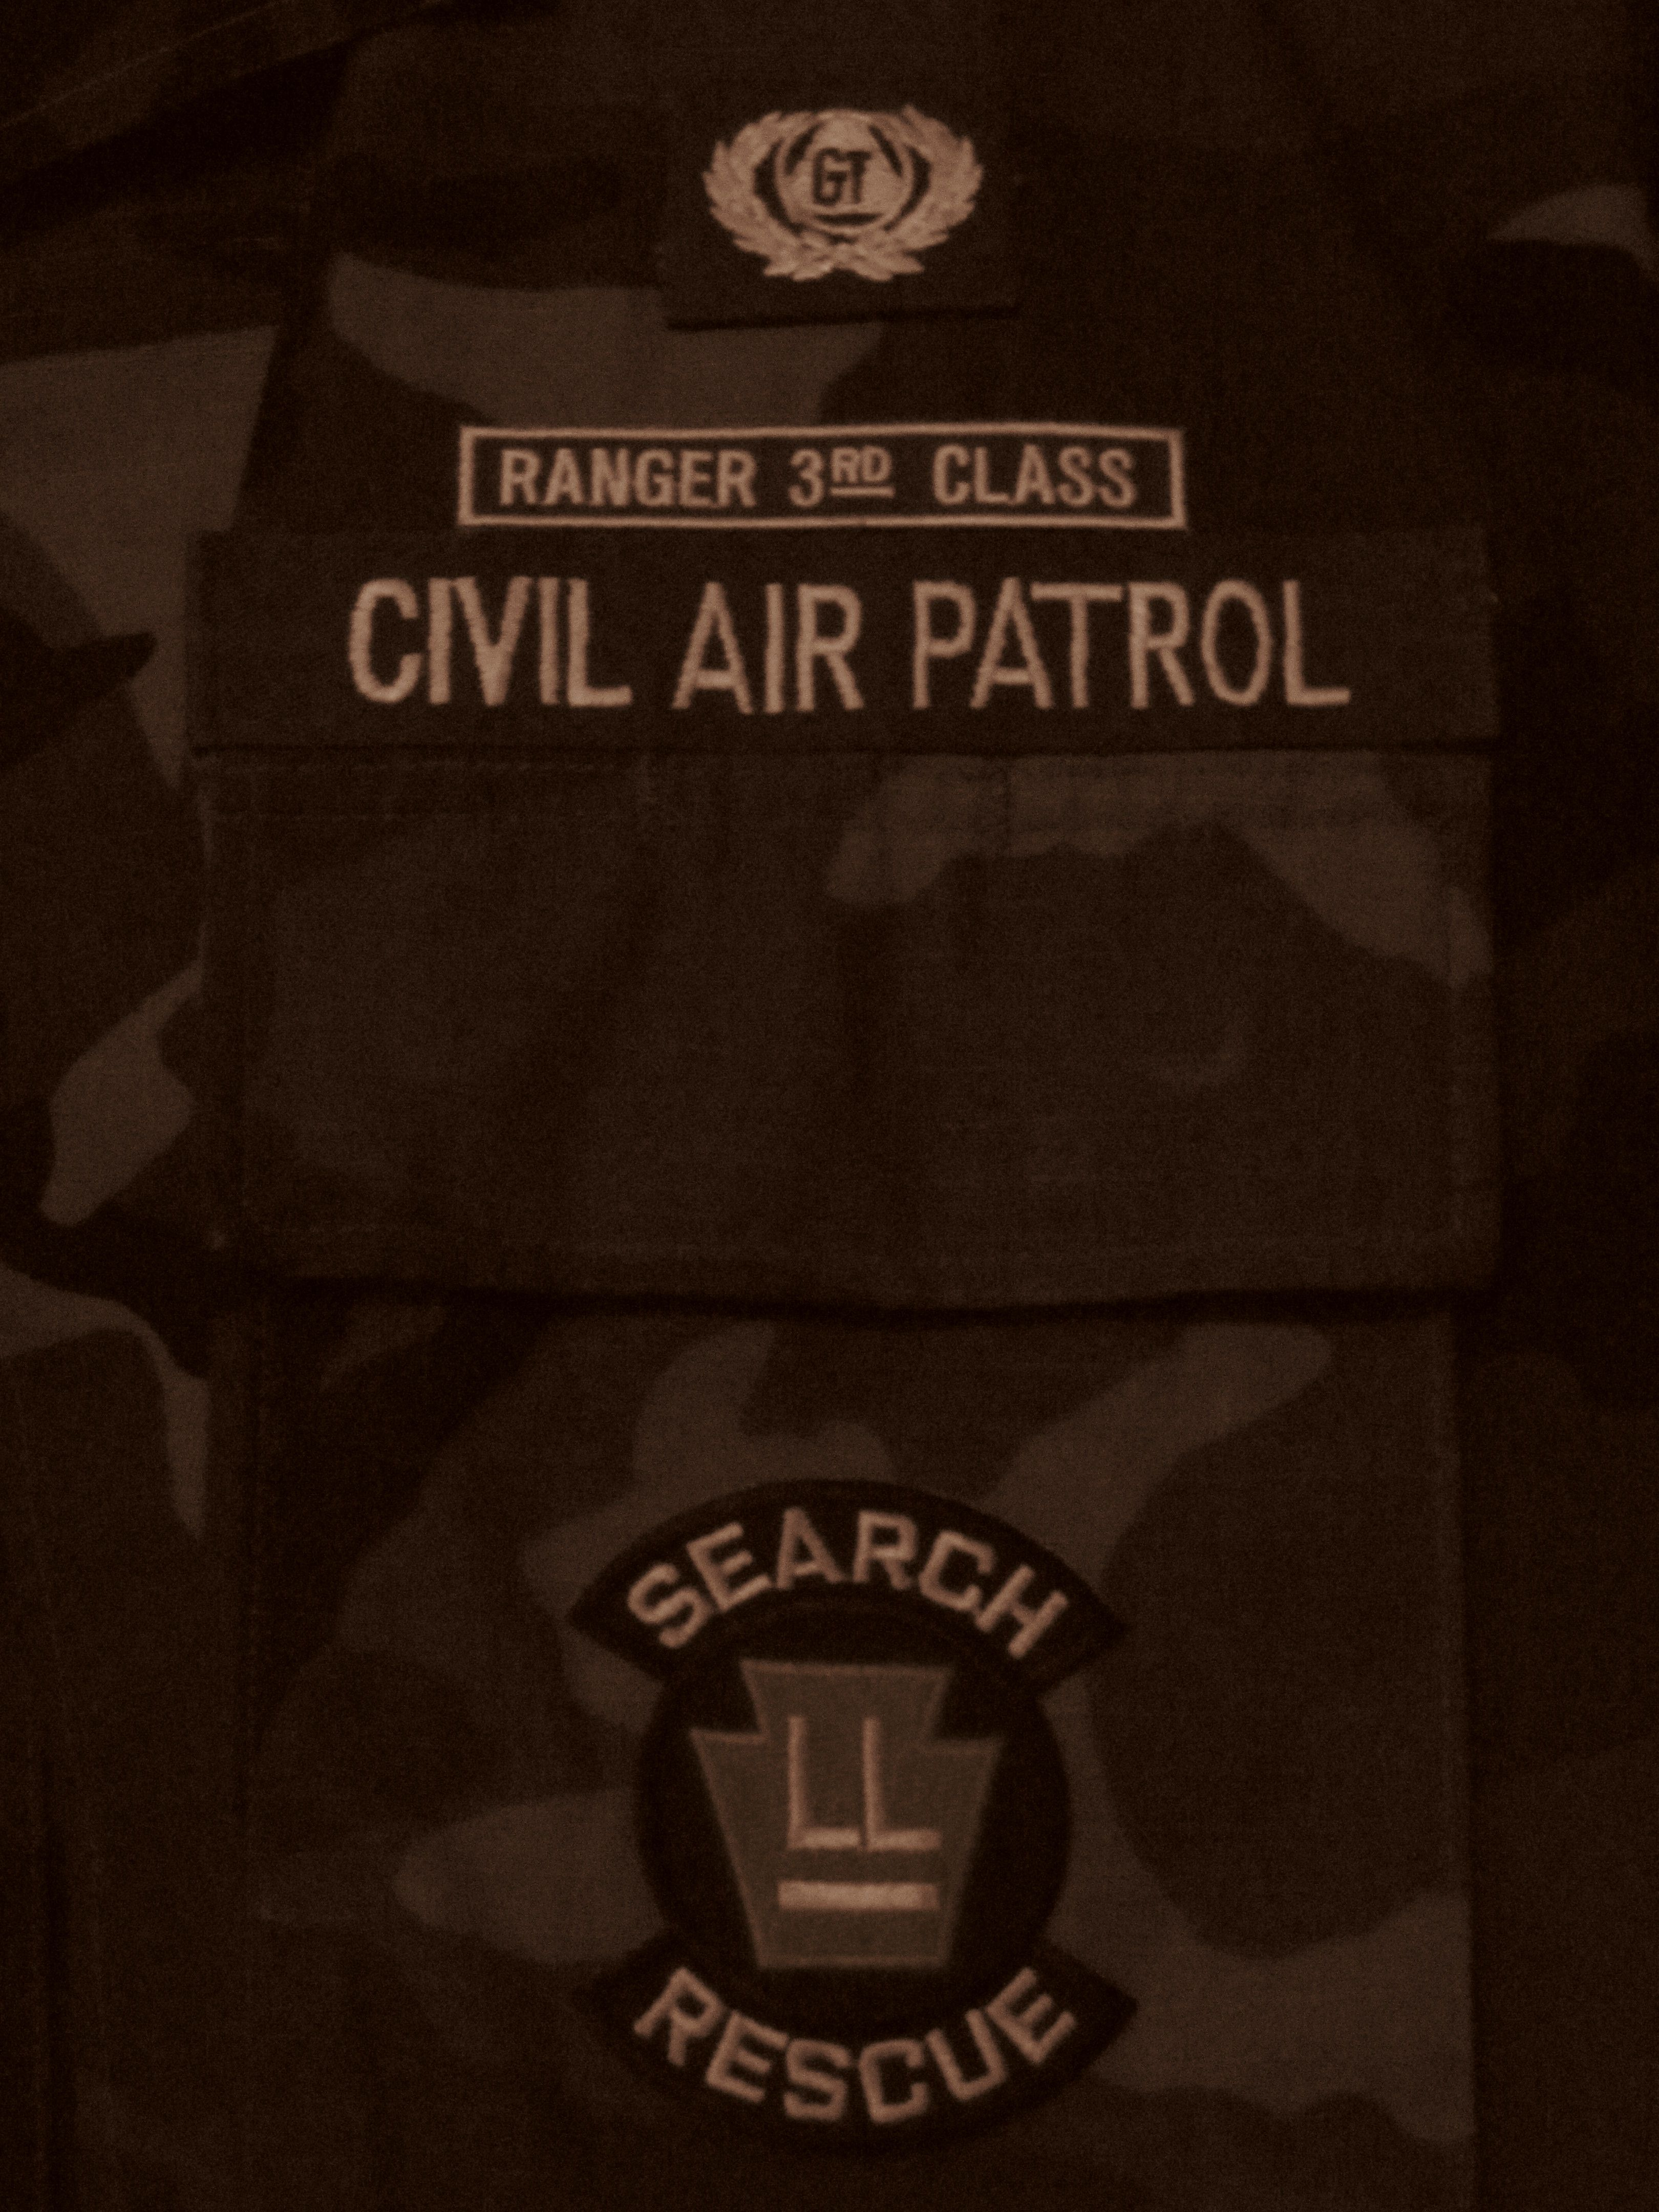 Civil Air Patrol battle dress uniform with Hawk Mountain